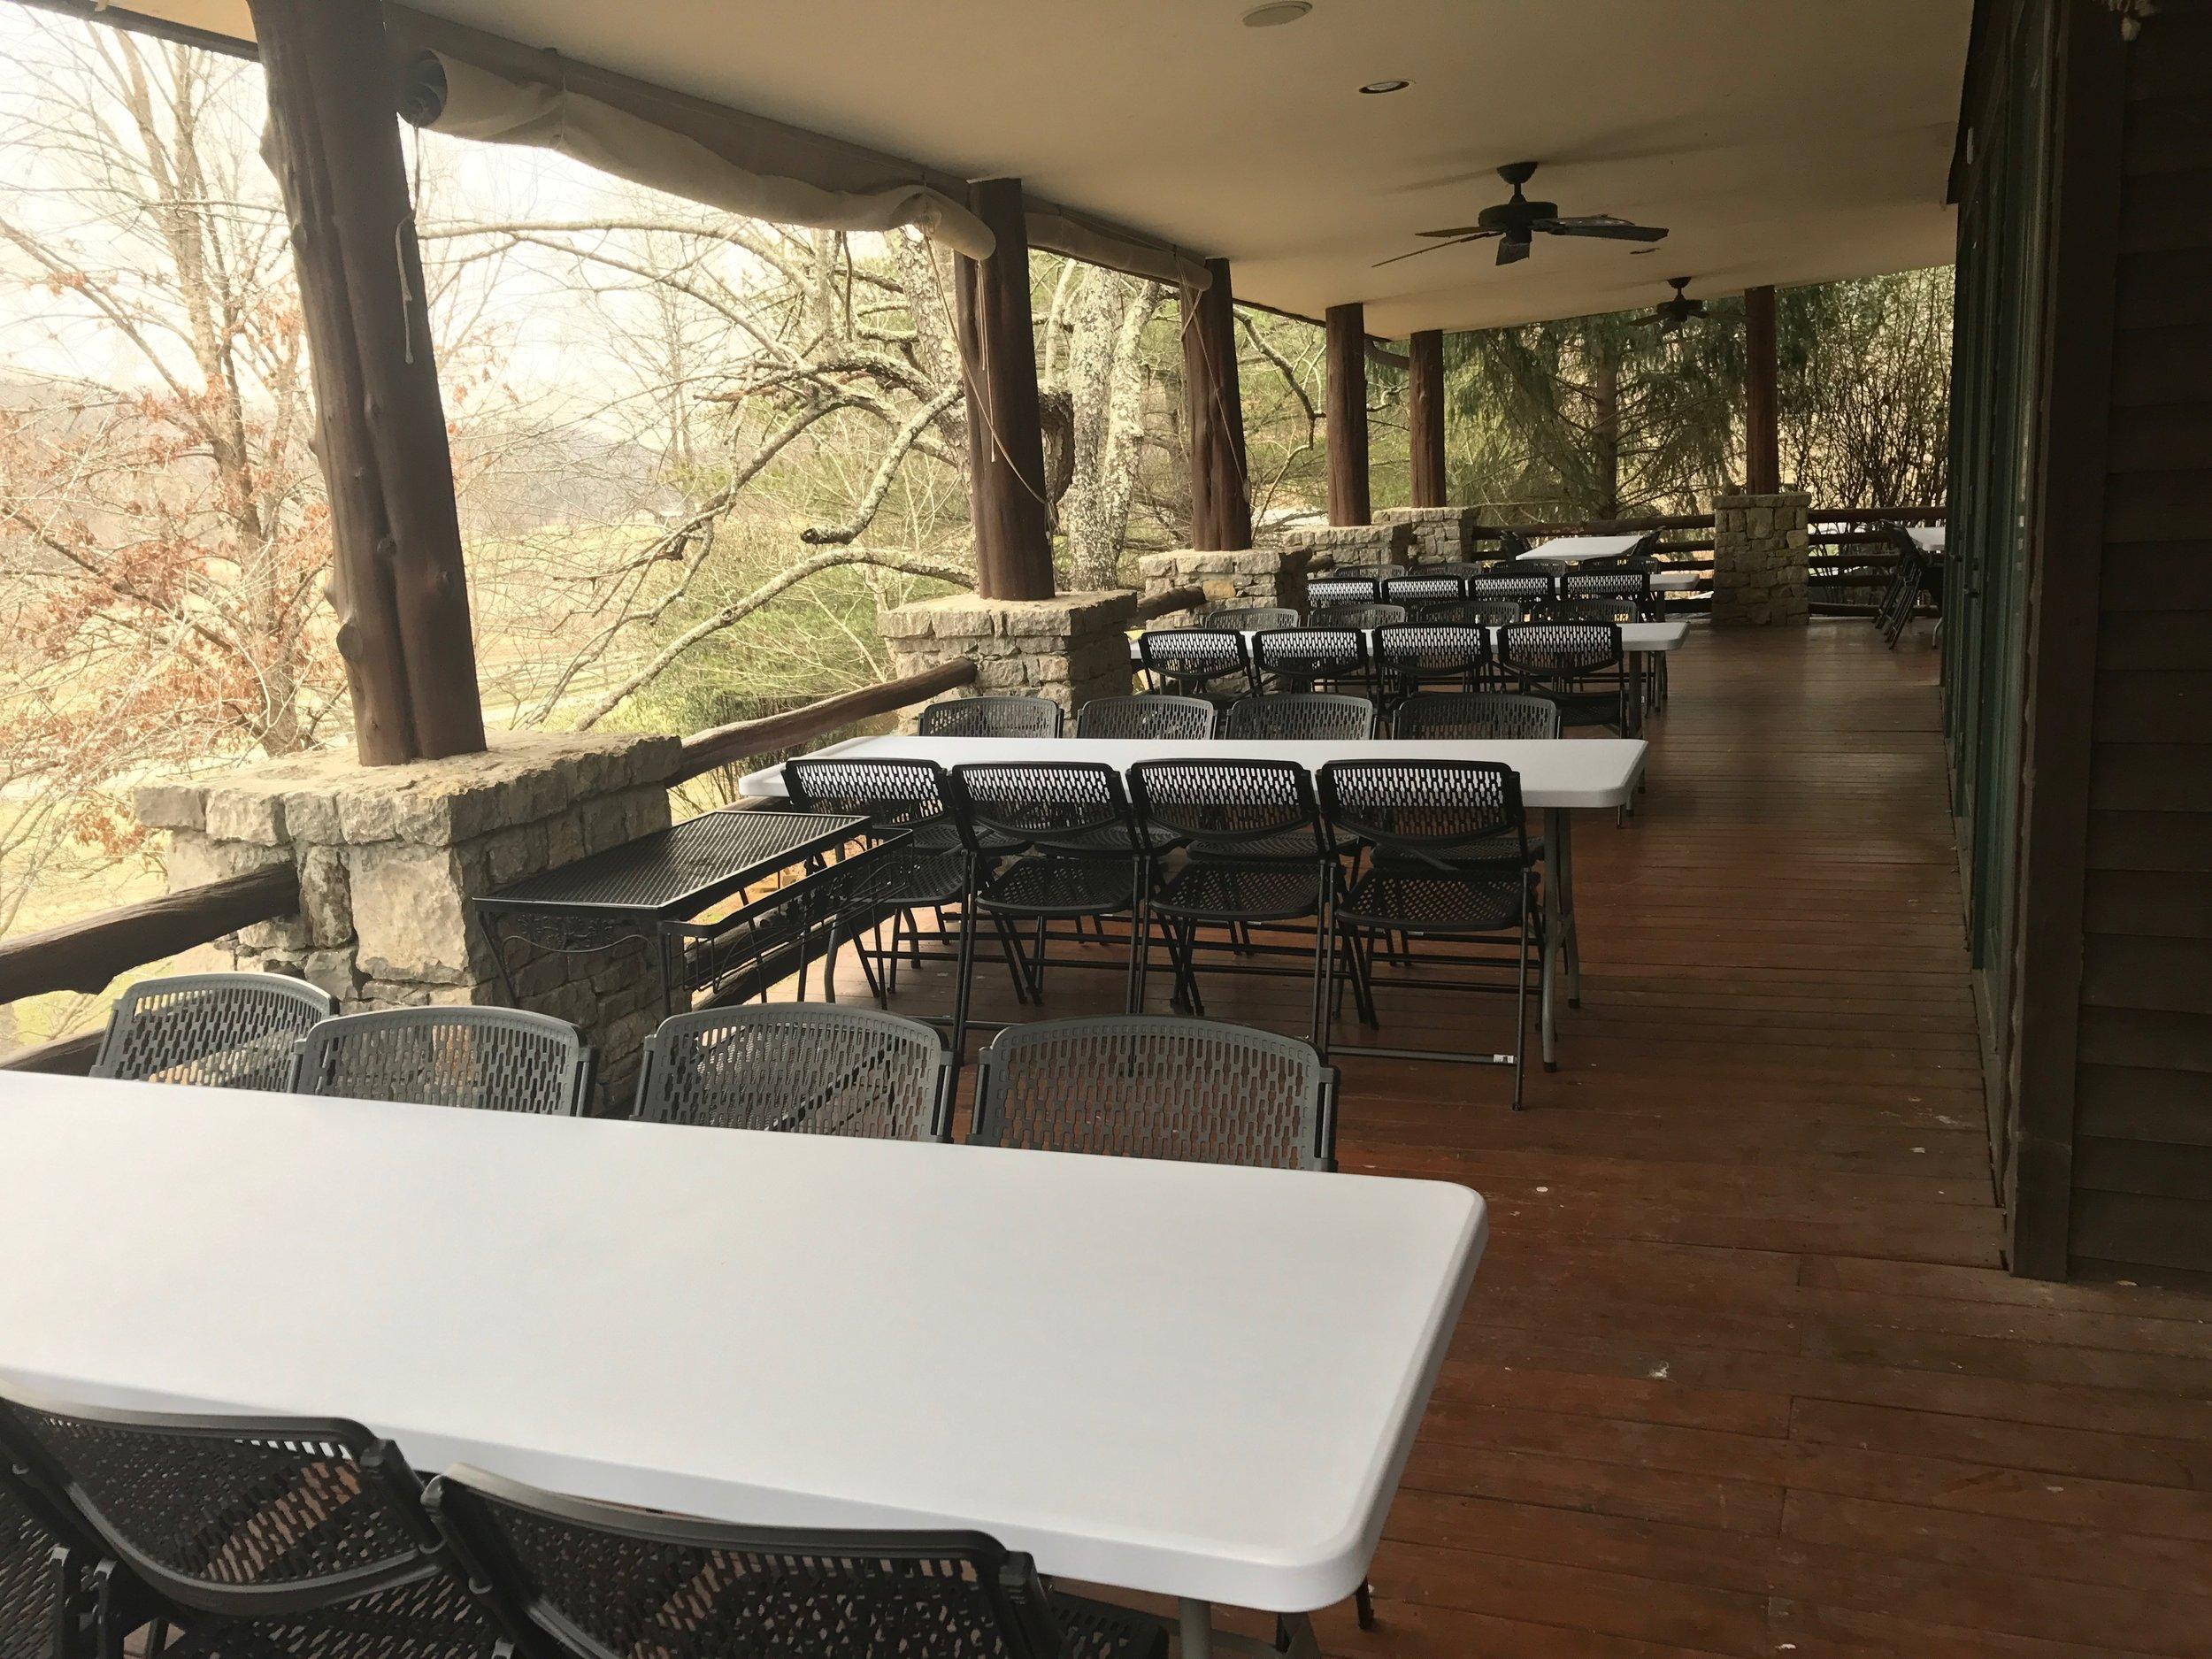 L conf 48 seats Longer Porch.JPG